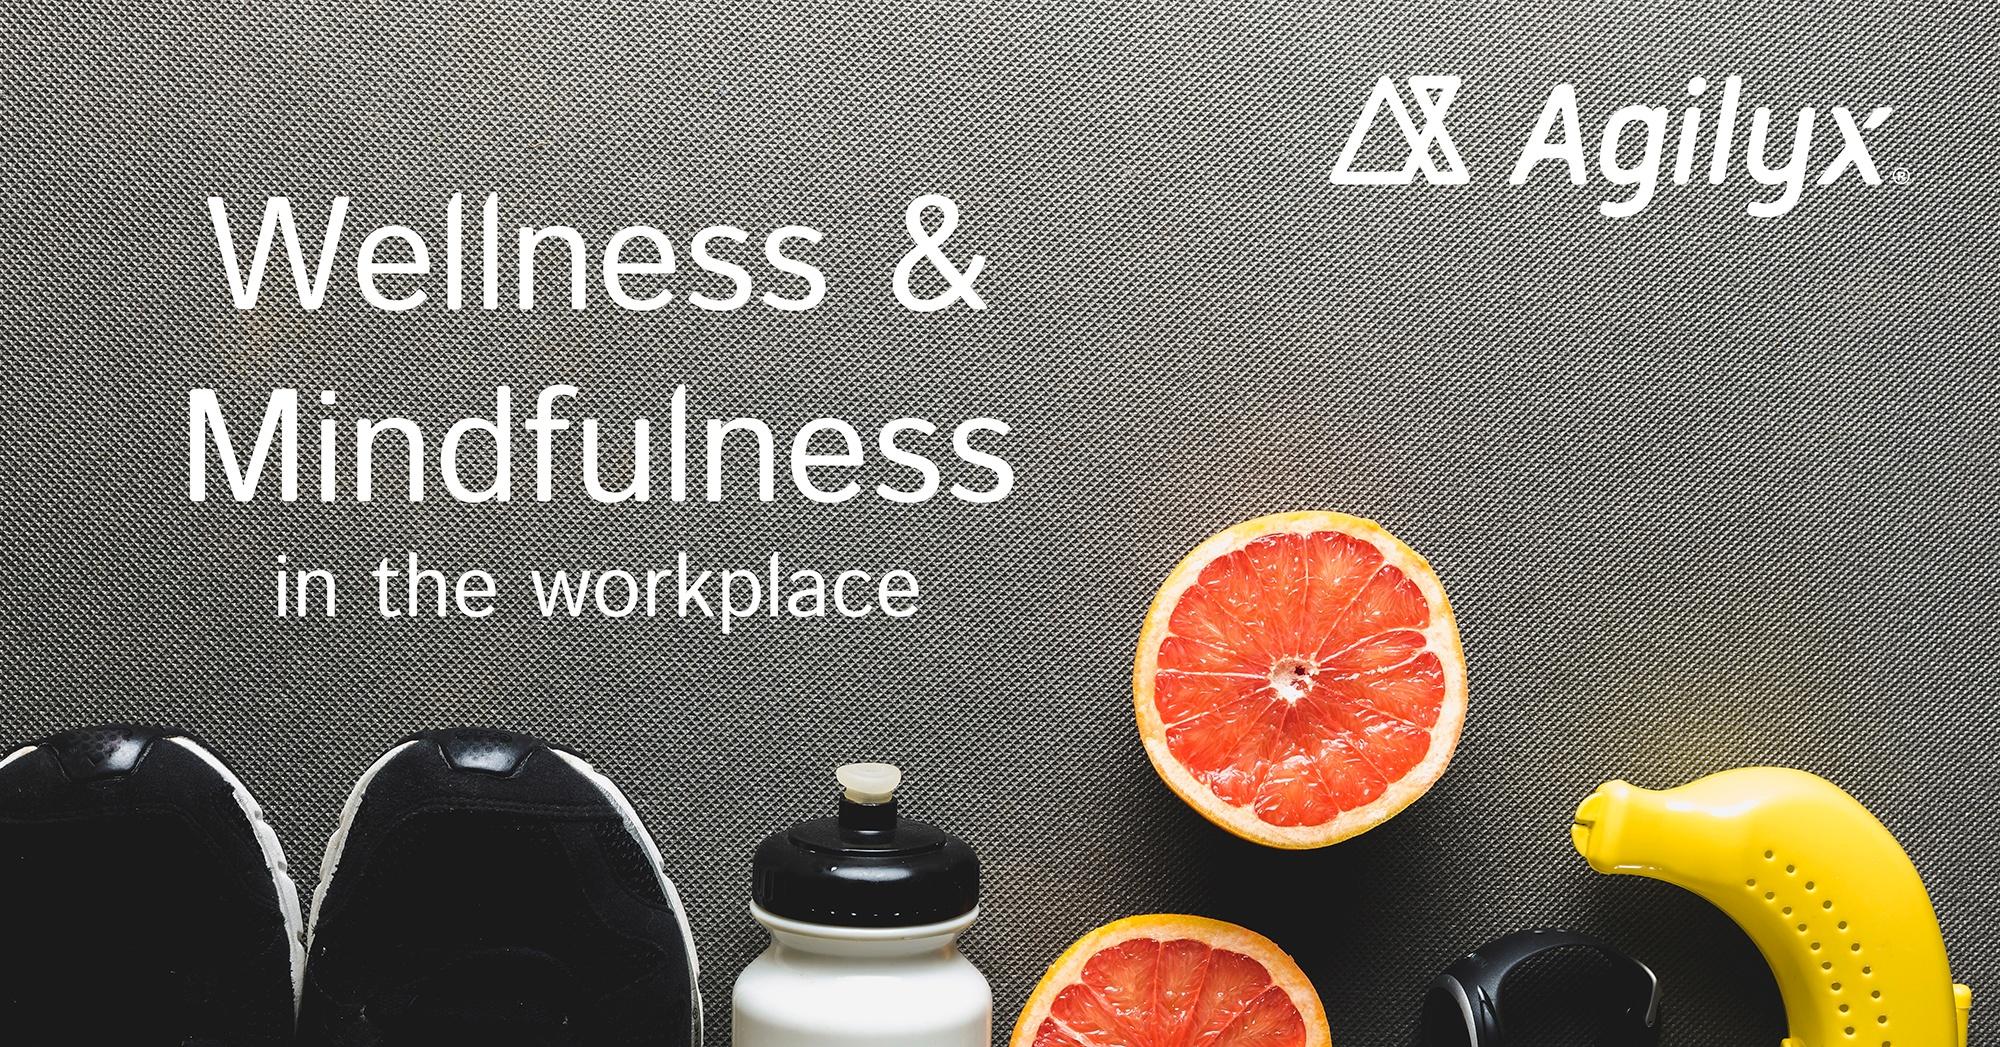 wellness and mindfulness SM post image small